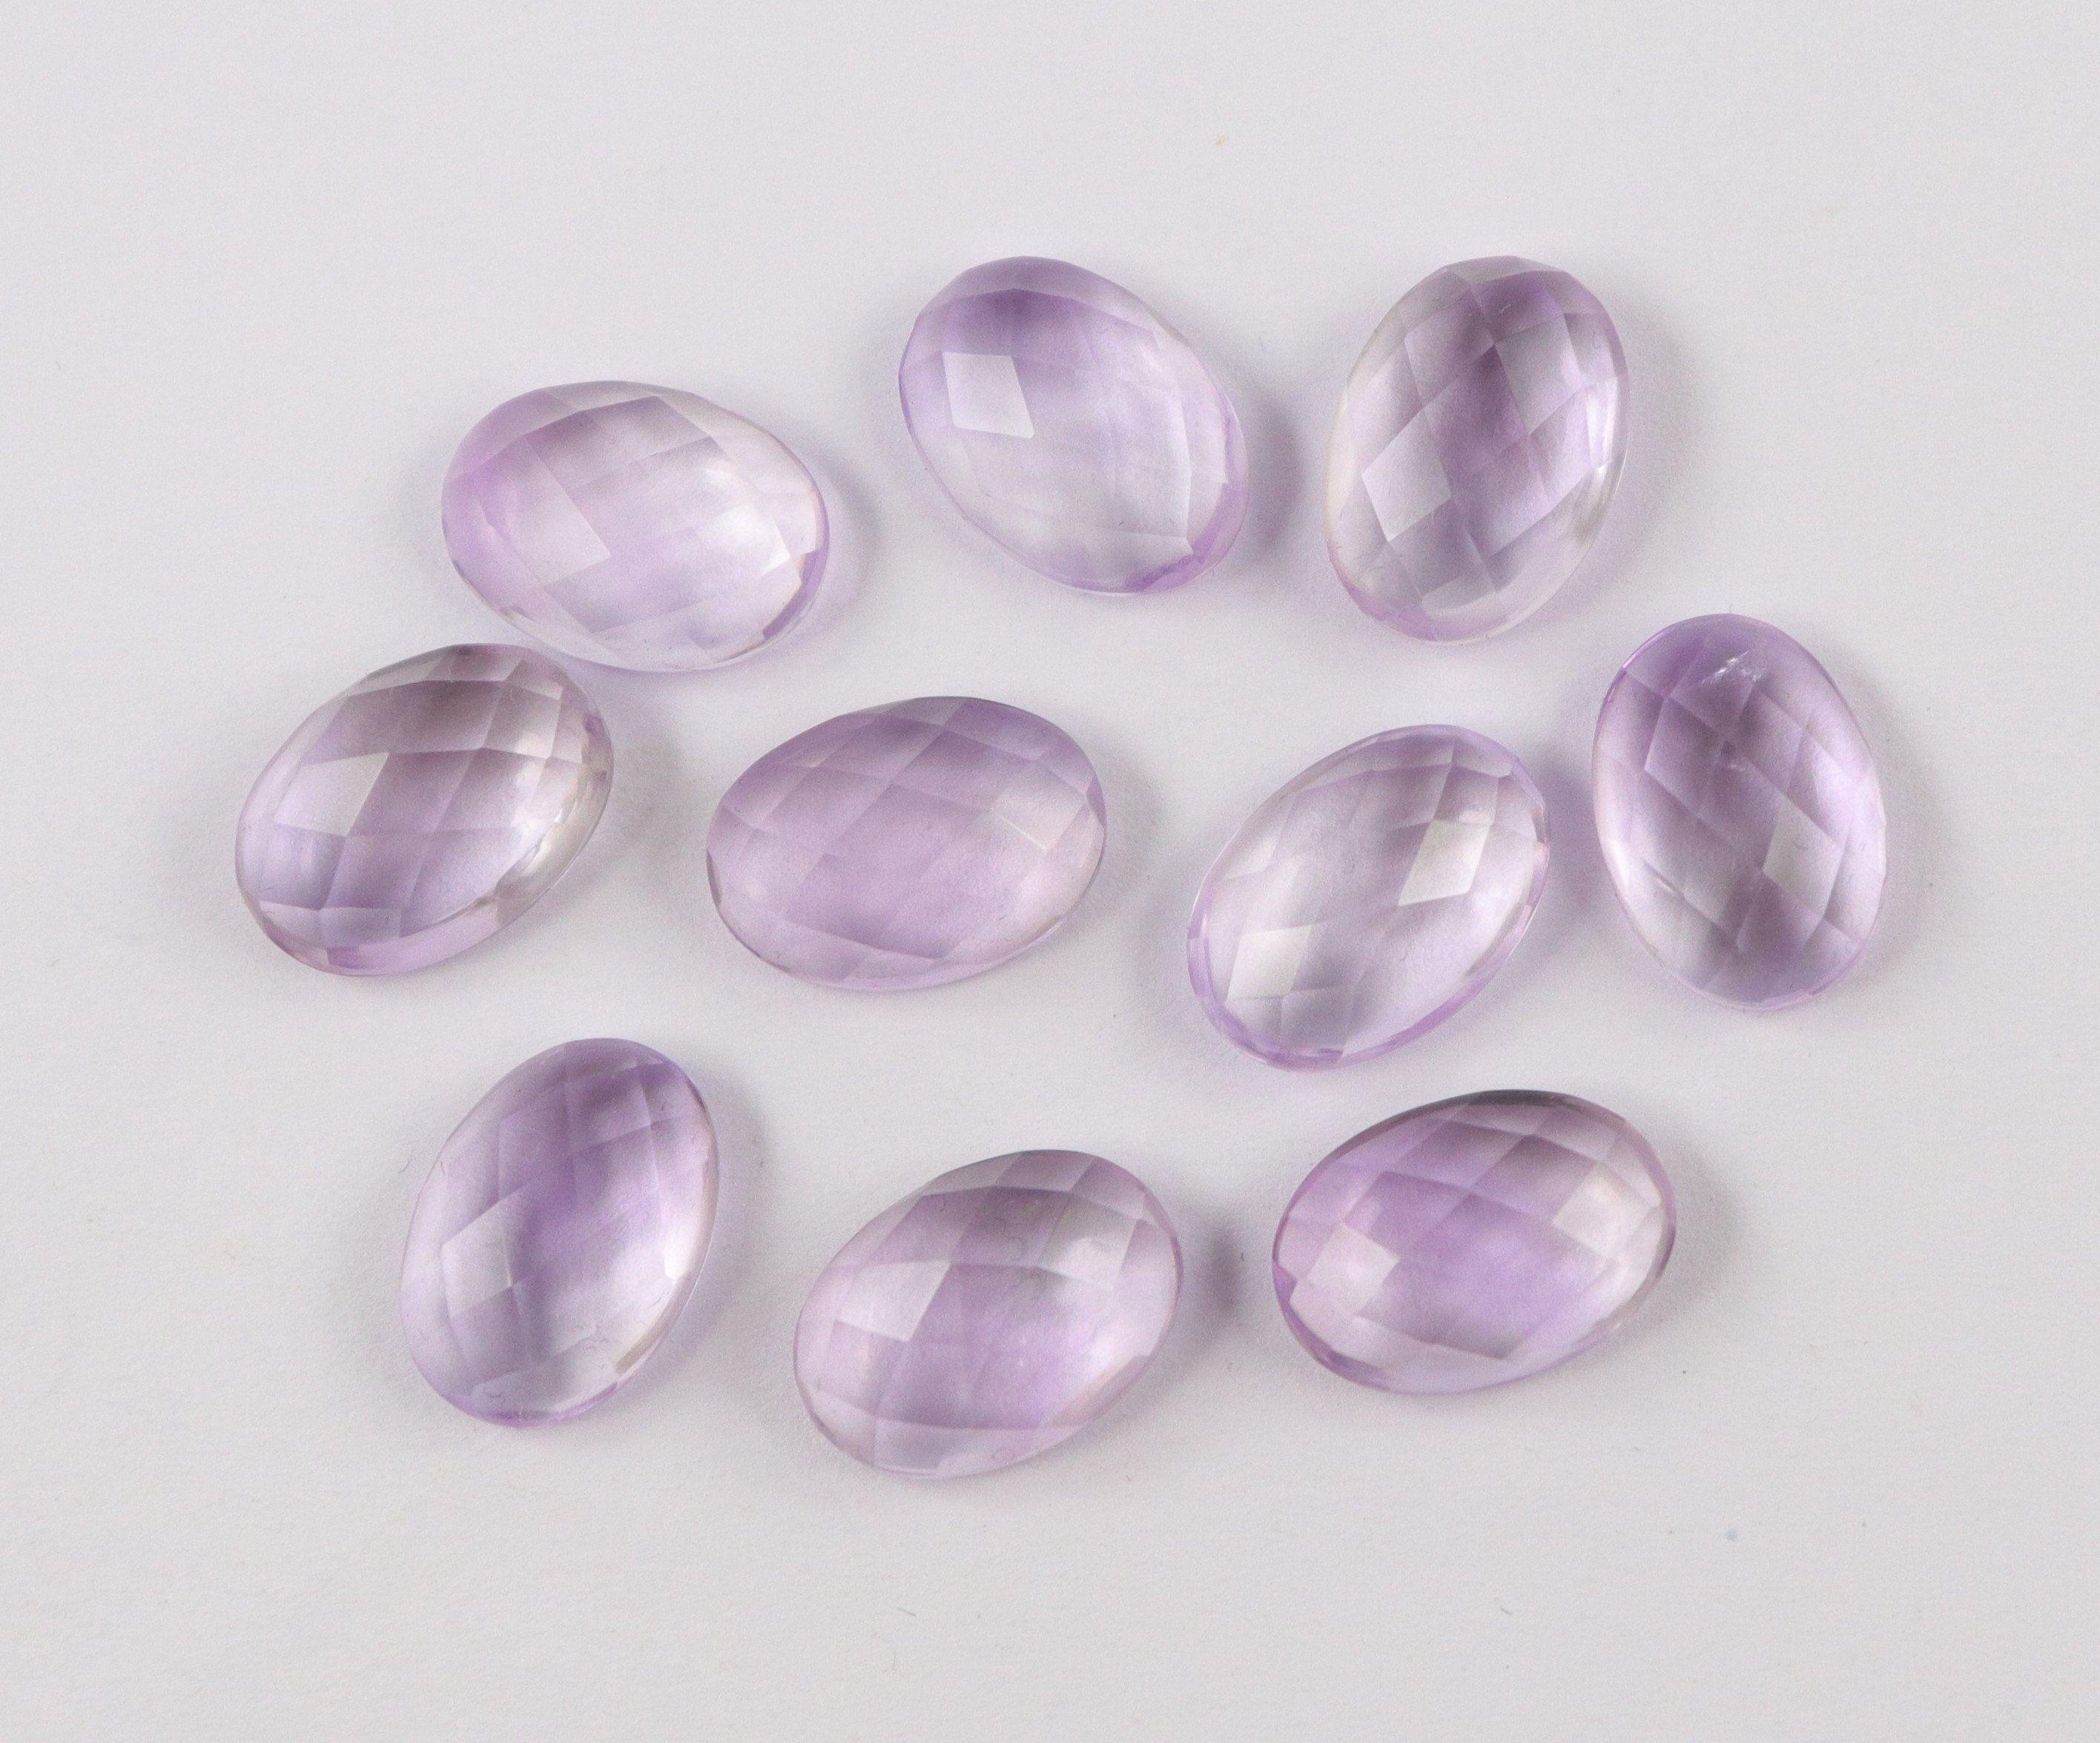 Amethyst Natural Rosecut Semi Precious Loose Jewelry Making Gemstone